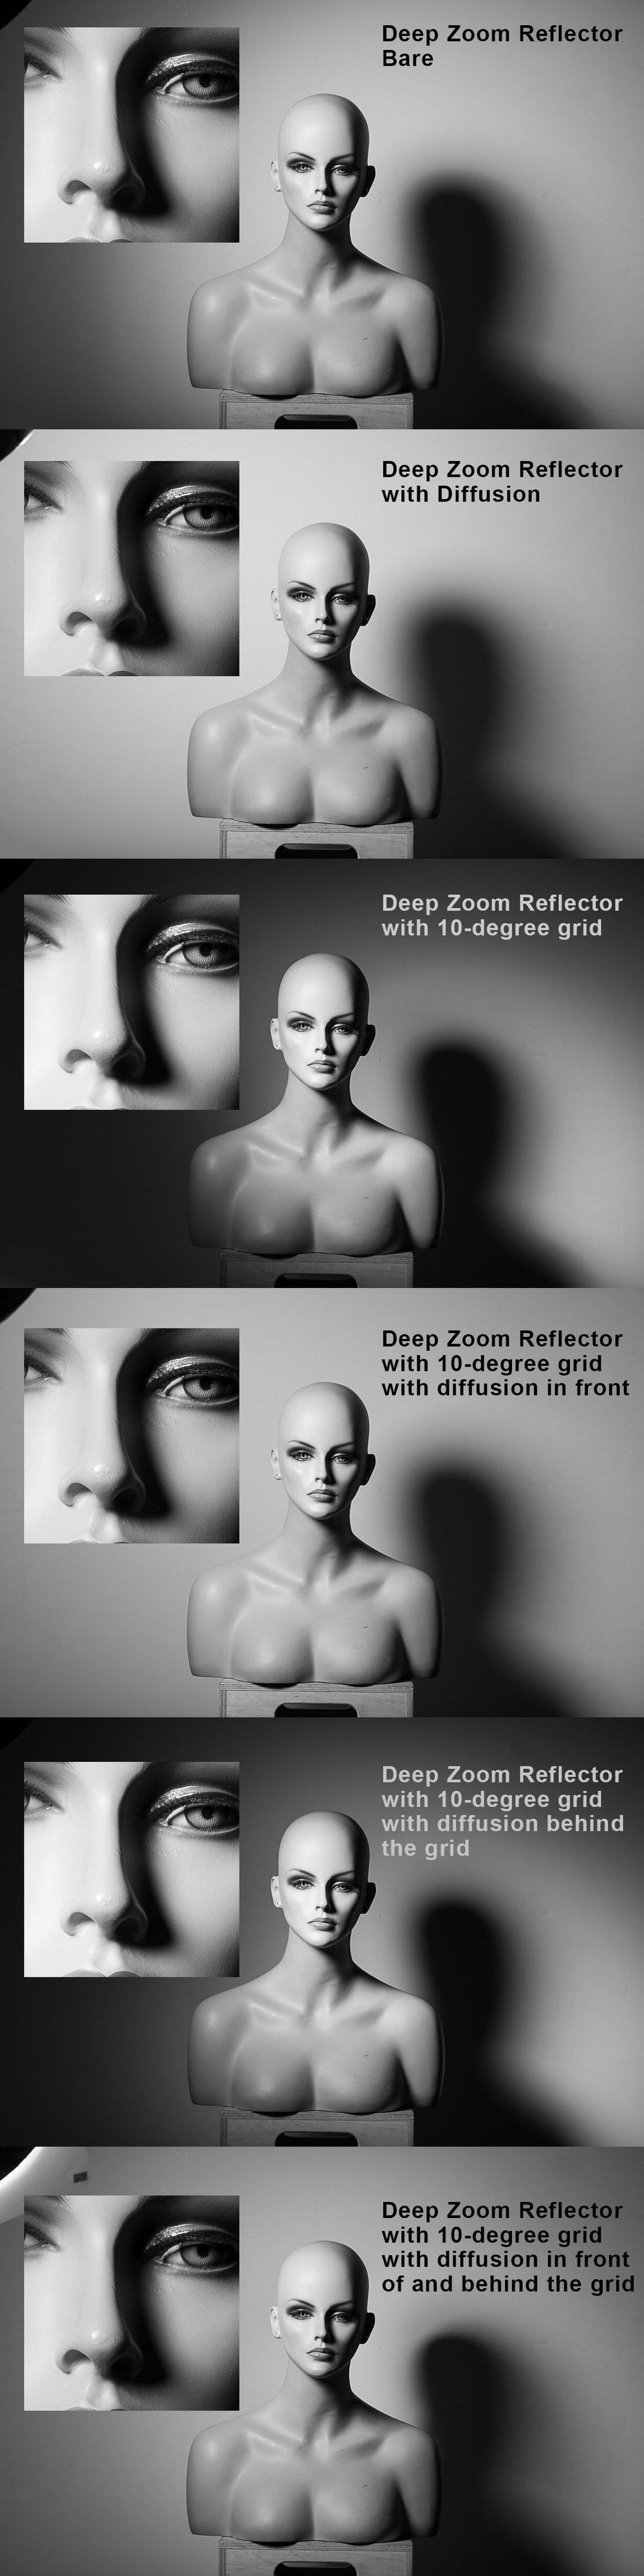 Deep Zoom Reflector examples